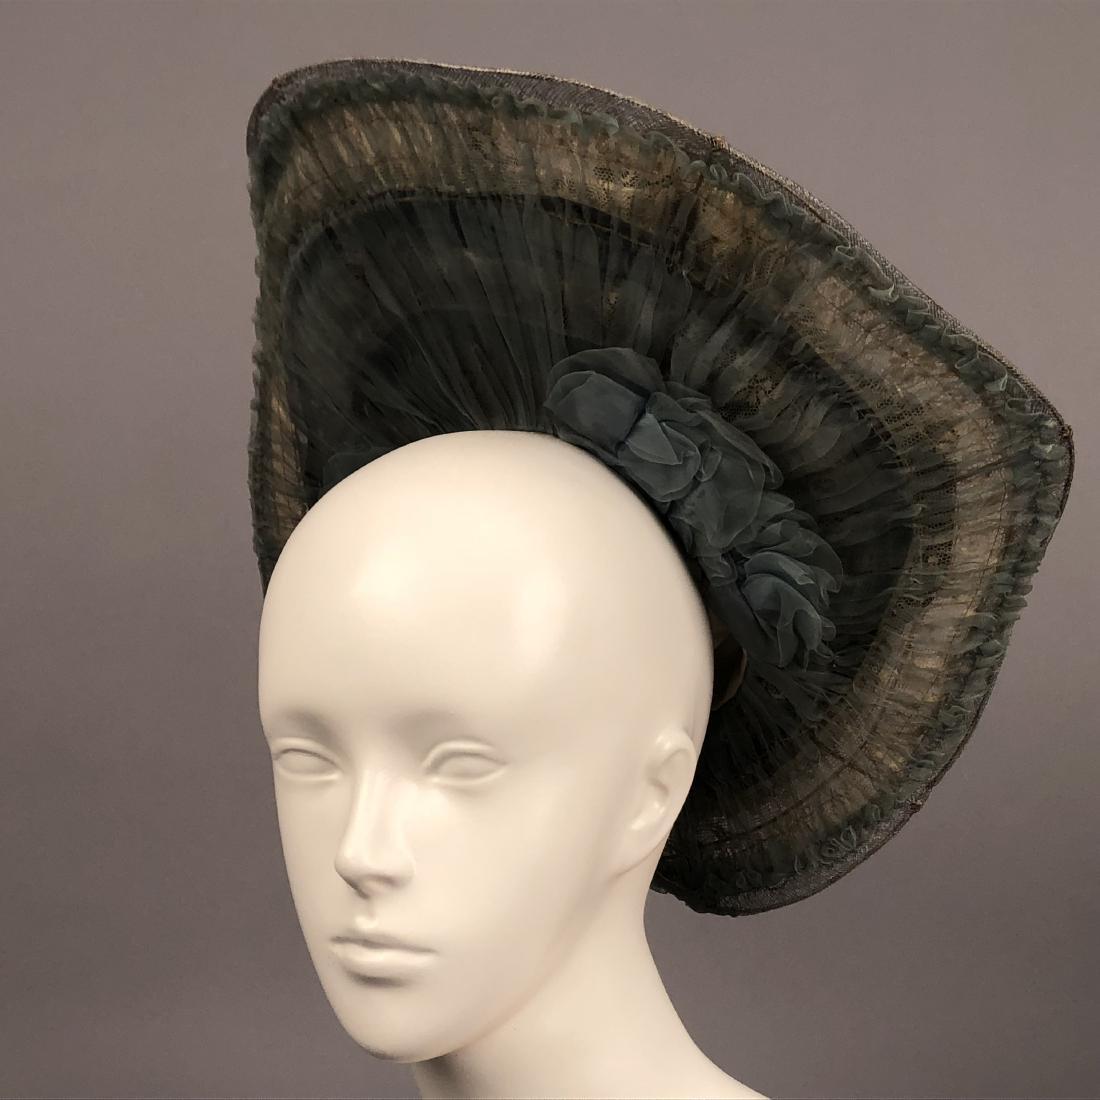 THREE WIDE-BRIM HATS, 1902 - 1910 - 6